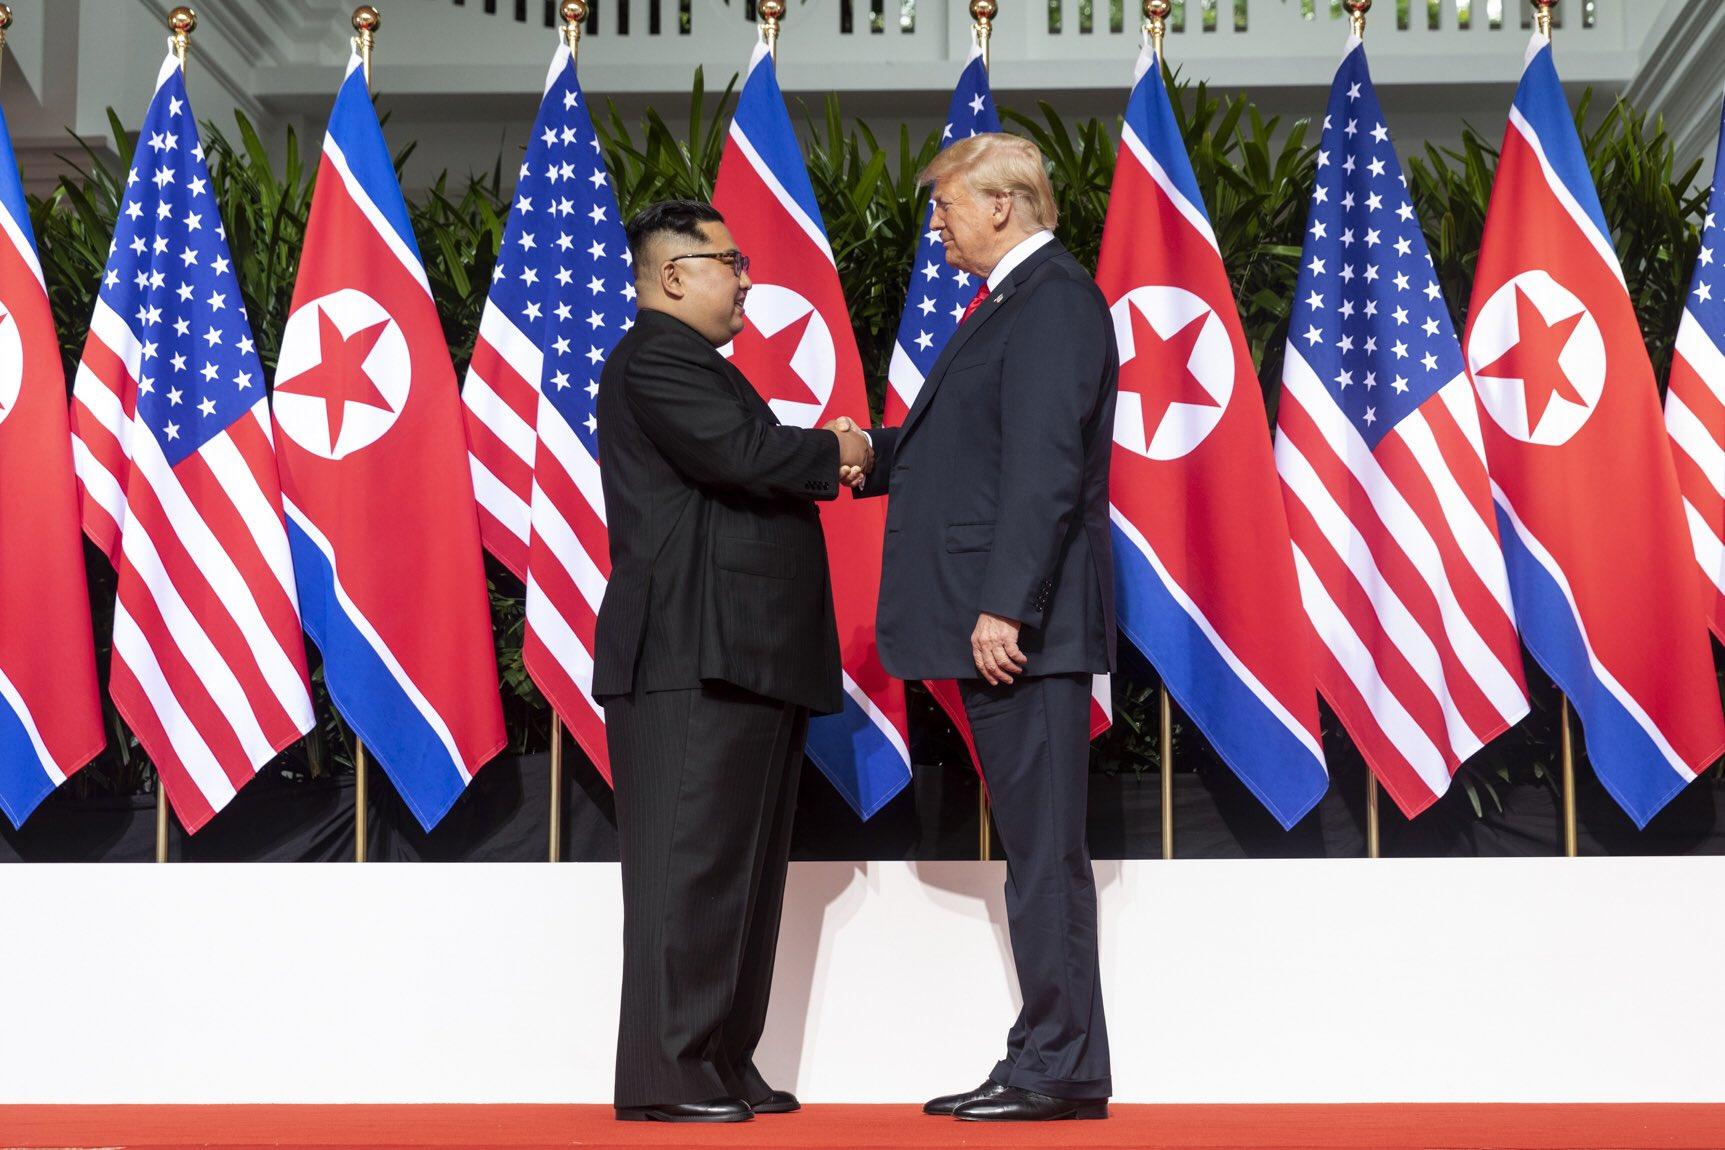 Kim Jon-un and Donald Trump shaking hands at the red carpet during the DPRK–USA Singapore Summit (한국어: 2018년 북미정상회담(싱가포르 회담) 자리에서 김정은 국무위원장(왼쪽)과 도널드 트럼프 대통령(오른쪽)이 악수를 하고 있다.) Photo taken in Singapore on June 12, 2018.